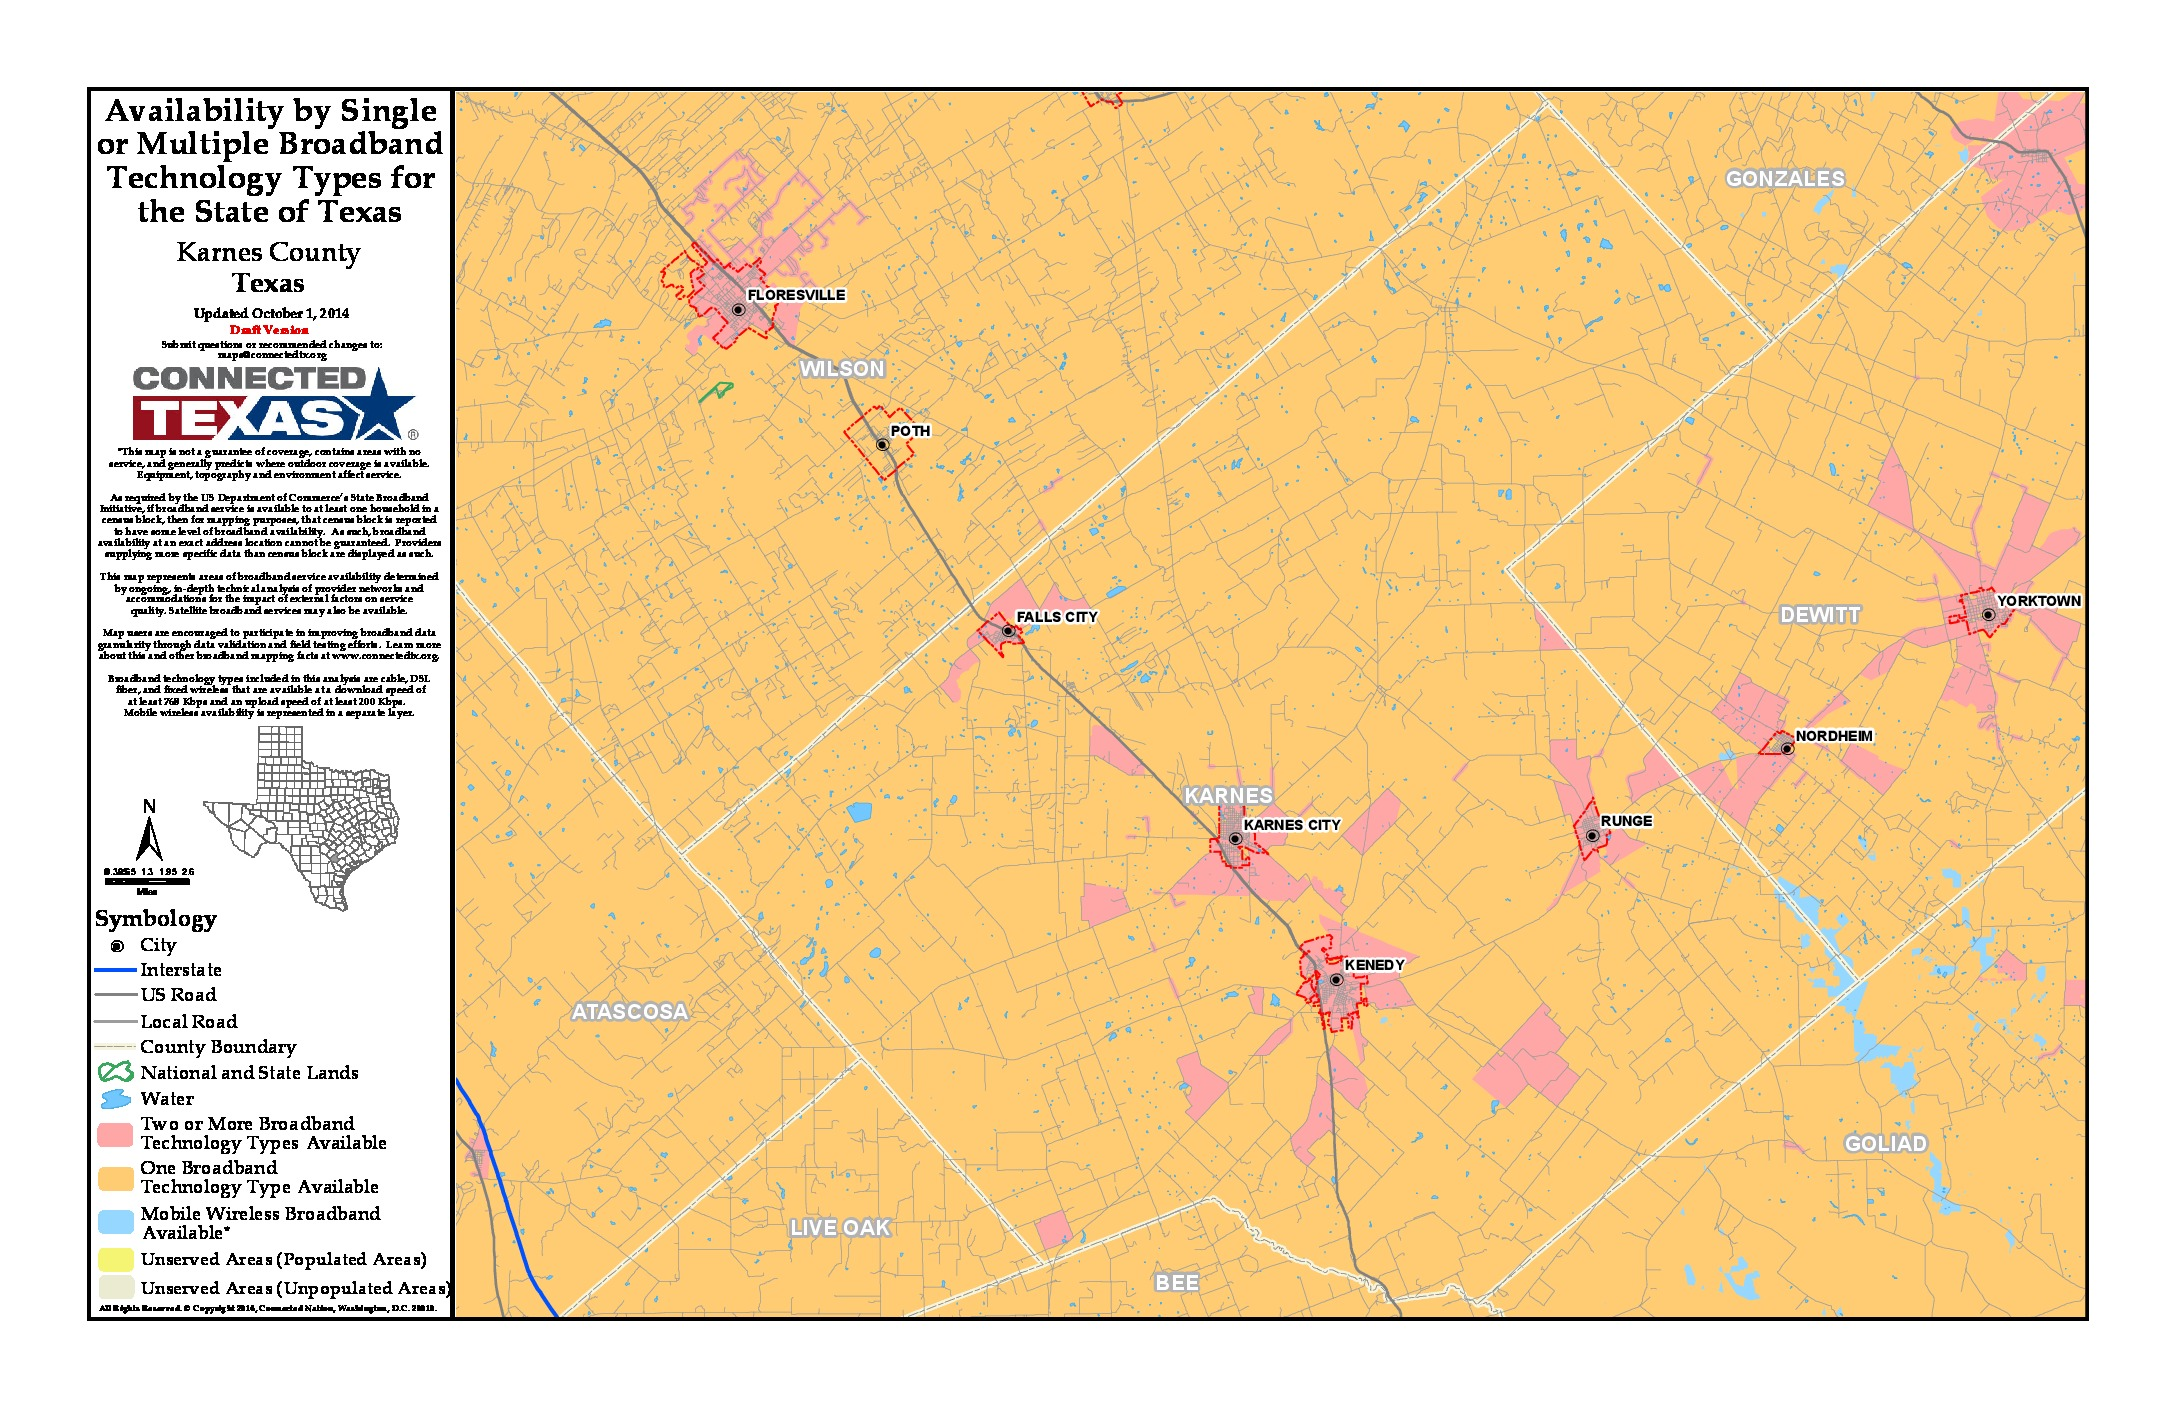 TX_MultiSinglePlatform_Karnes - Connected Texas